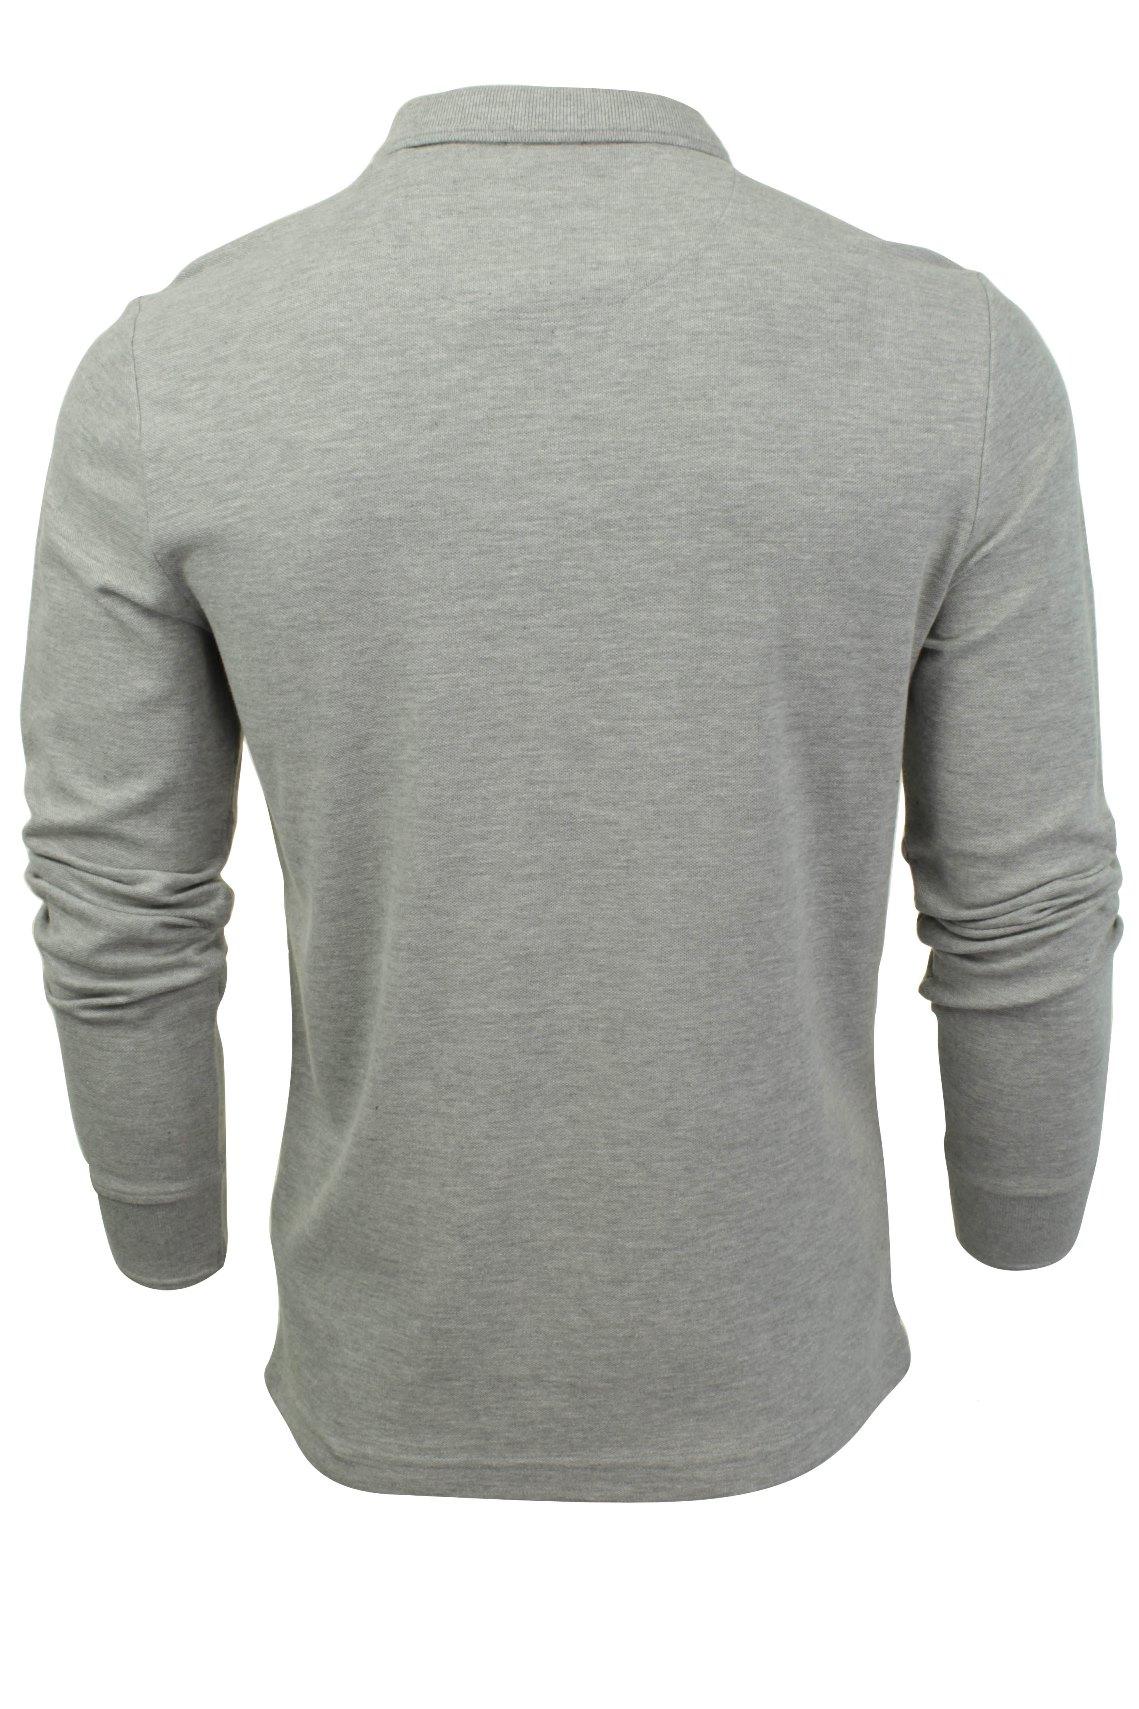 Mens-Polo-T-Shirt-by-Original-Penguin-039-Winston-039-Long-Sleeved thumbnail 8